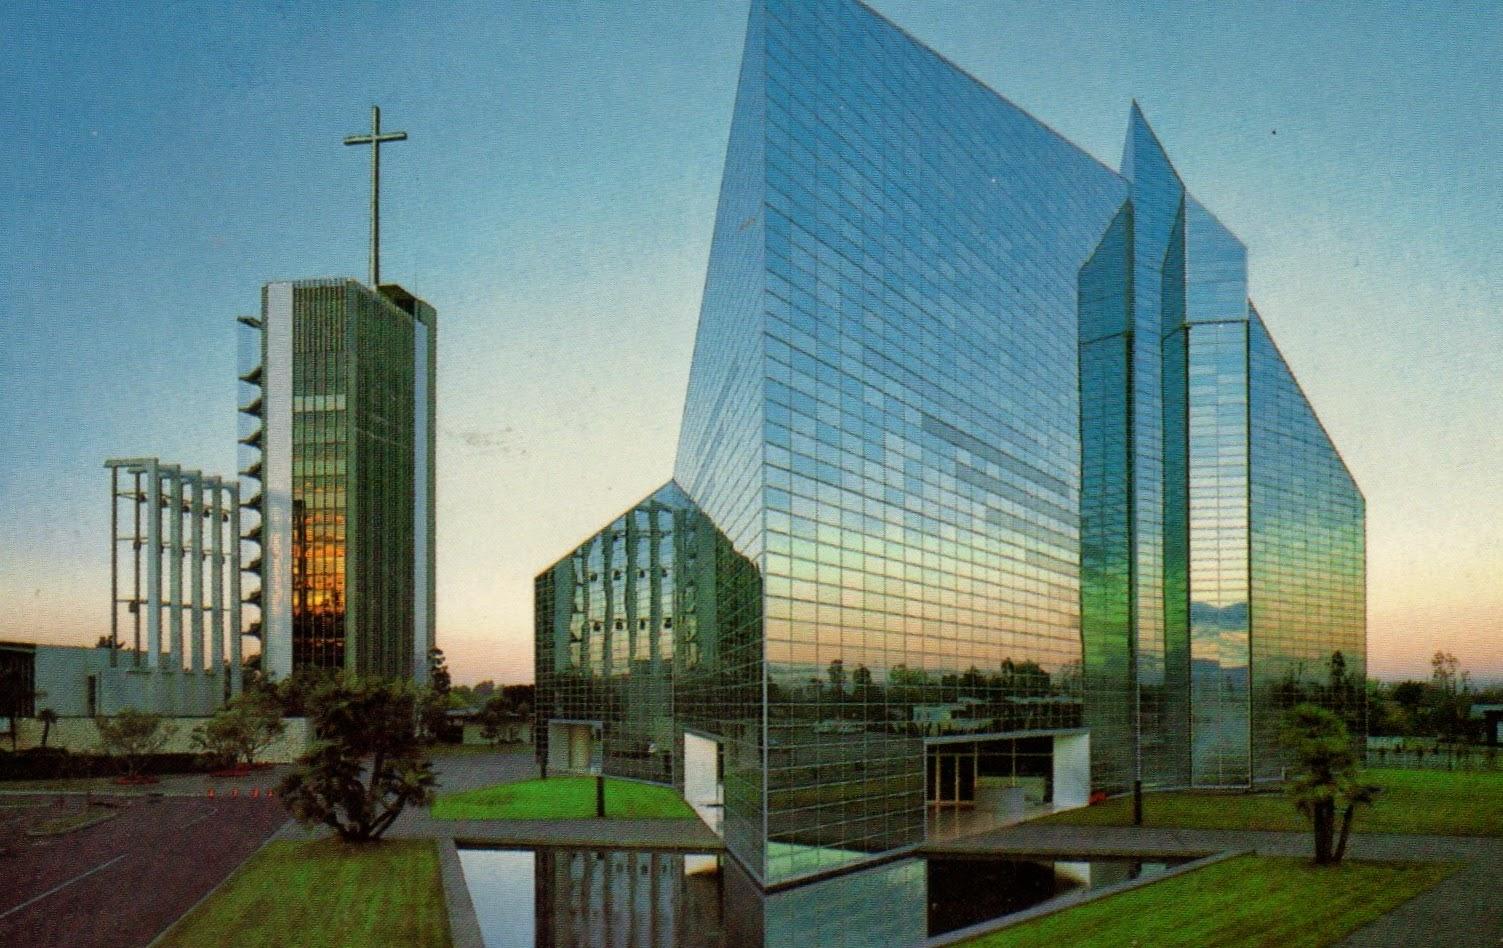 catedral de cristal em Los Angeles